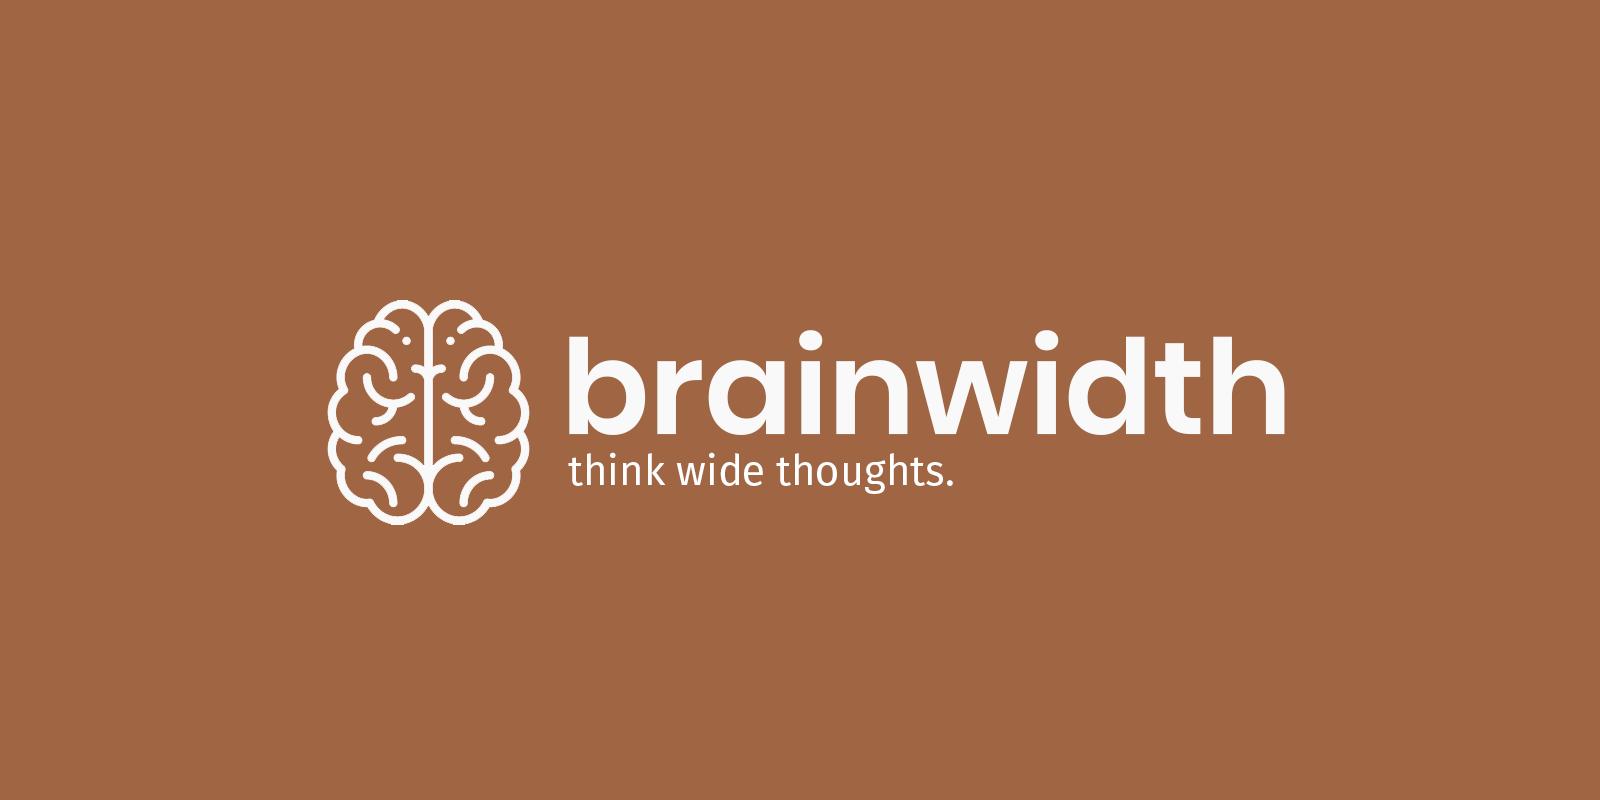 Brainwidth Image